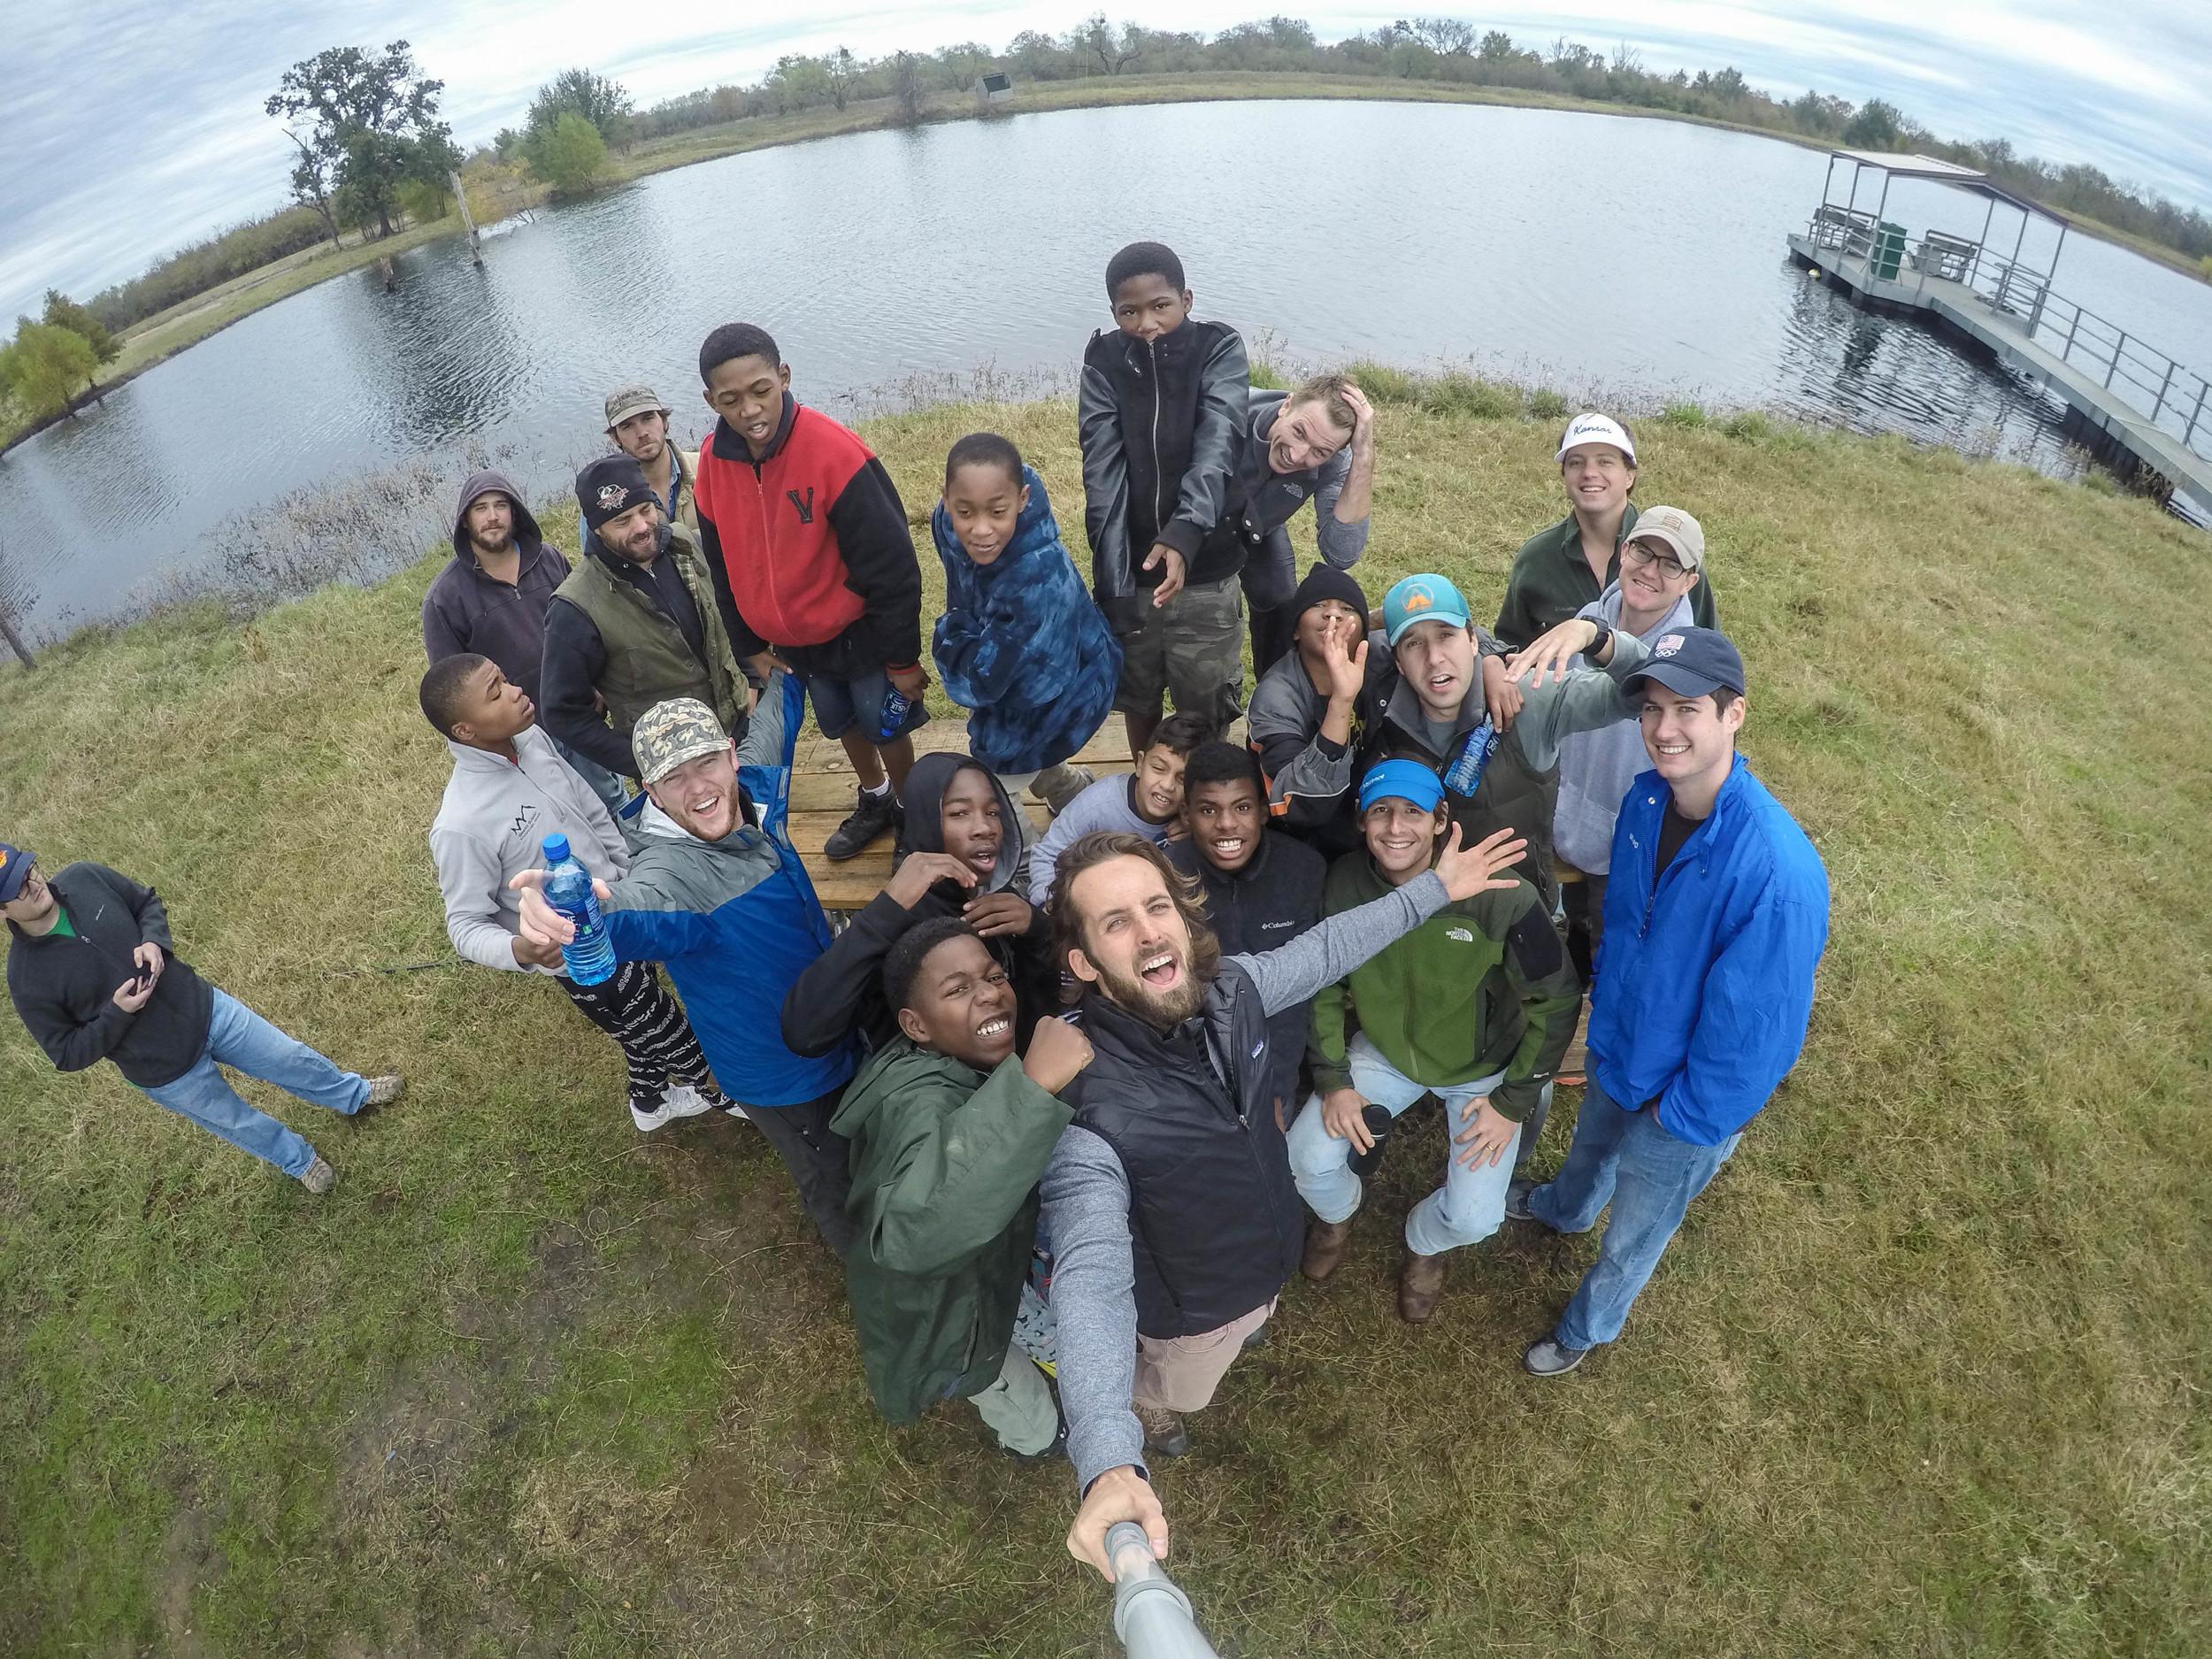 Camp Firewalker GoPro-3.jpg